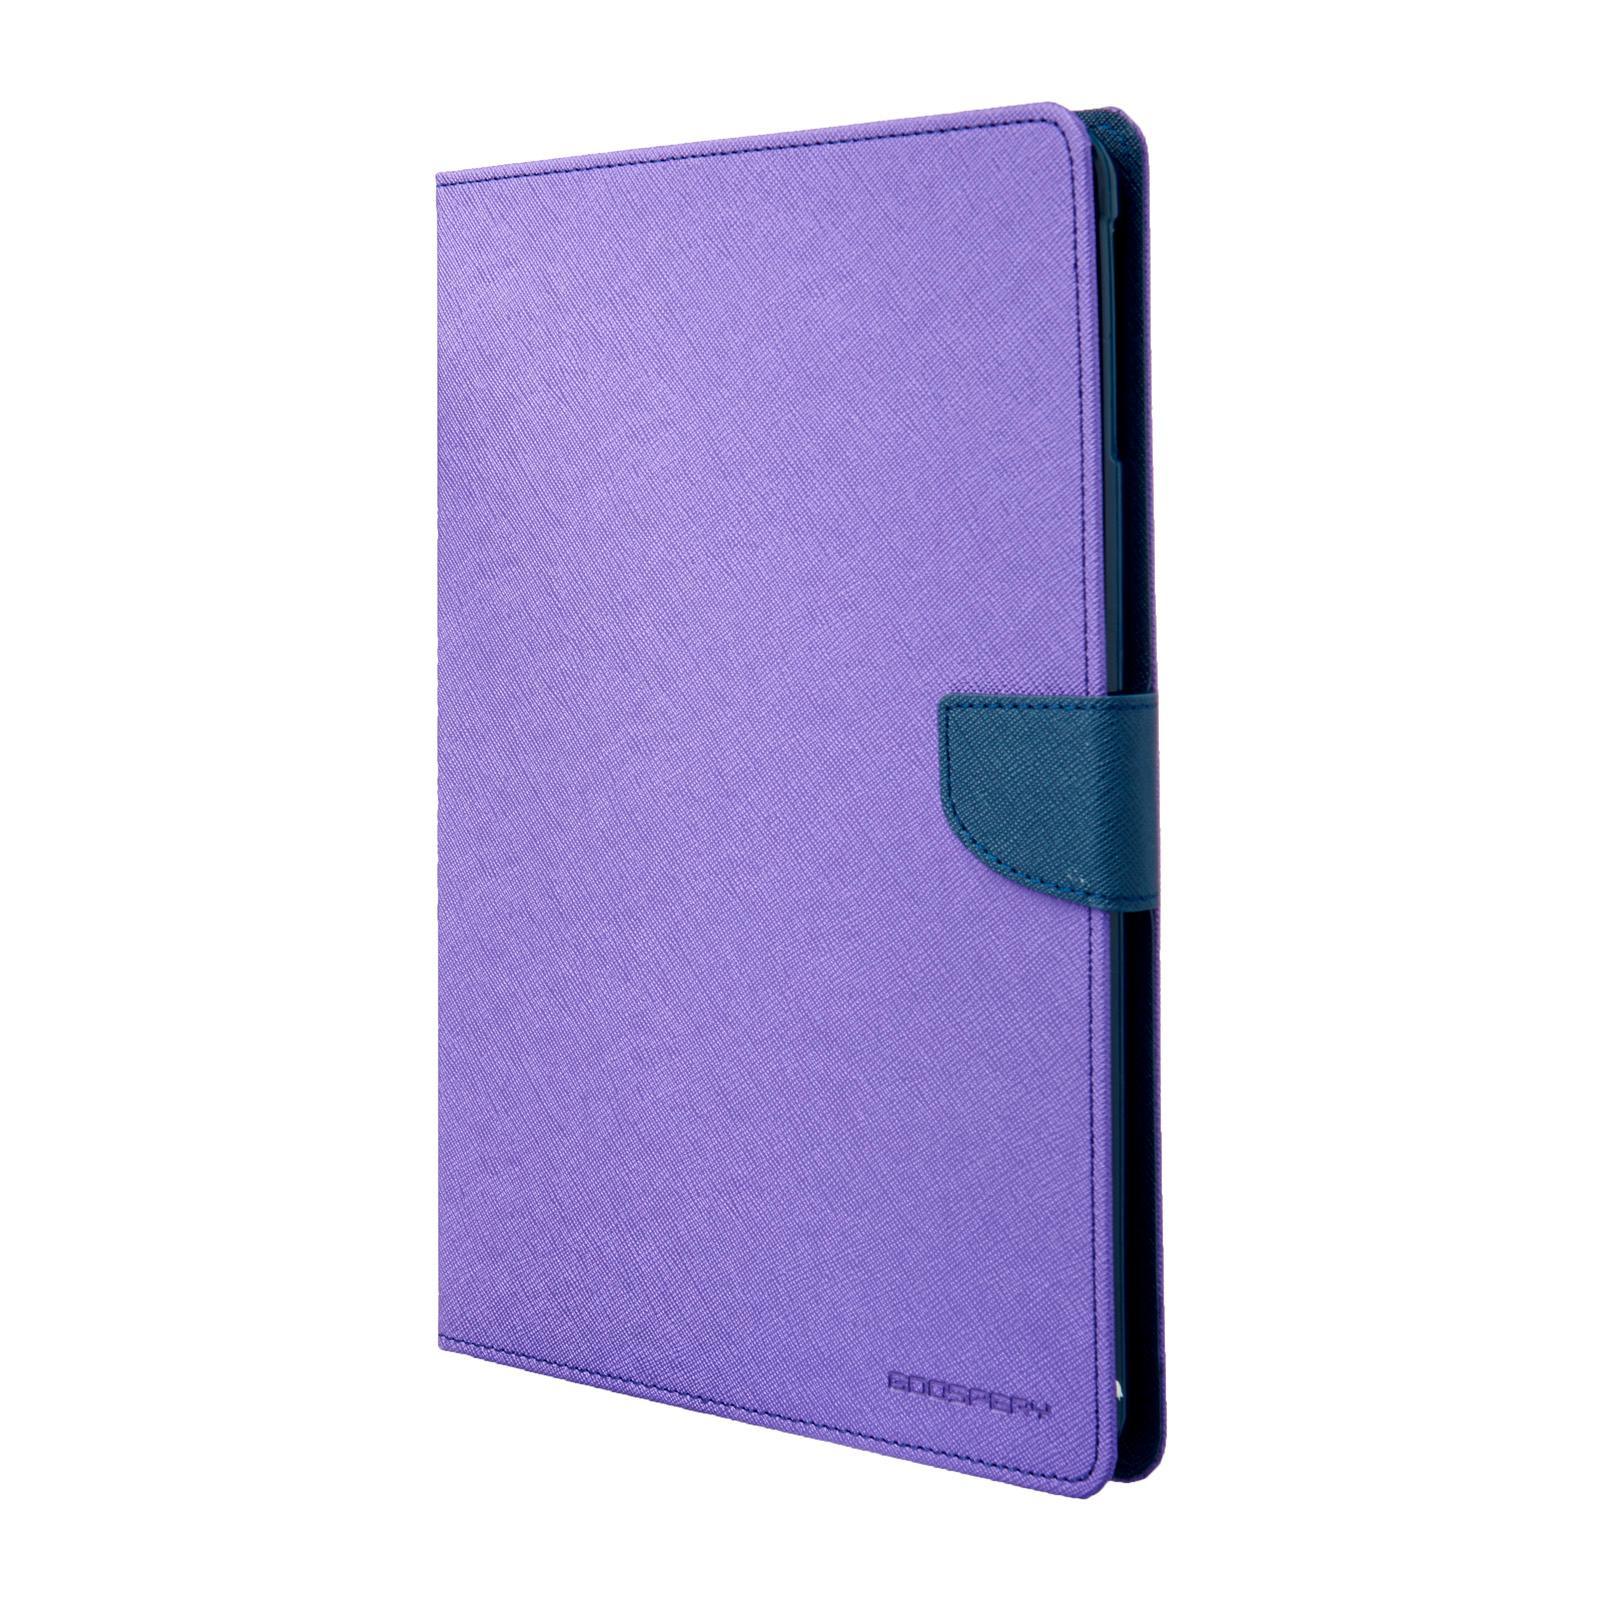 Pouzdro / kryt pro Apple iPad Air 1 - Mercury, Fancy Diary Purple/Navy